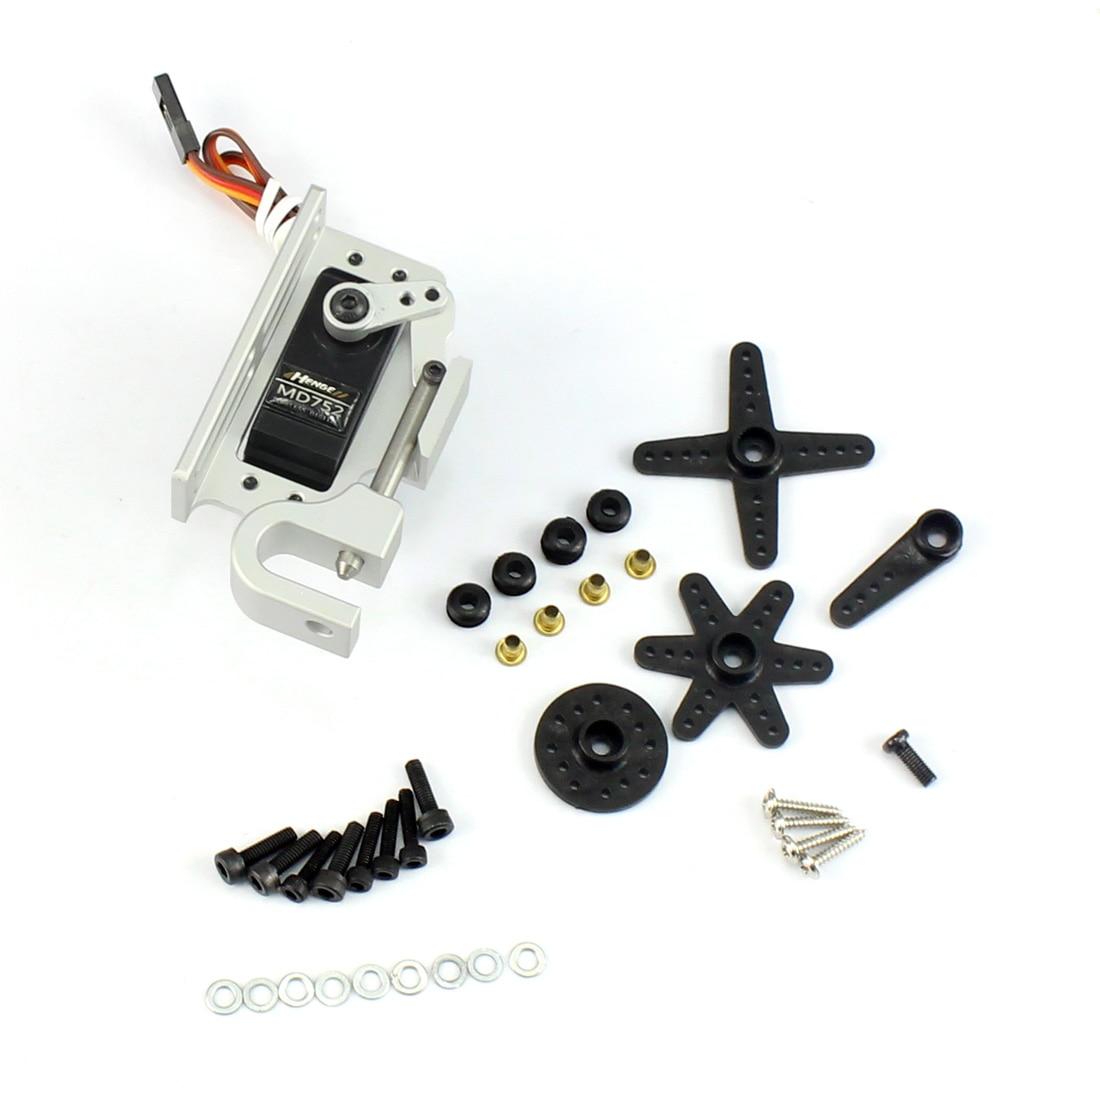 Tarot Dispensers Parabolic Device Metal Servo Actuator High Torque Stringing Parabolic with Servo TL2961-01 / TL2961-02 F18660/1<br>